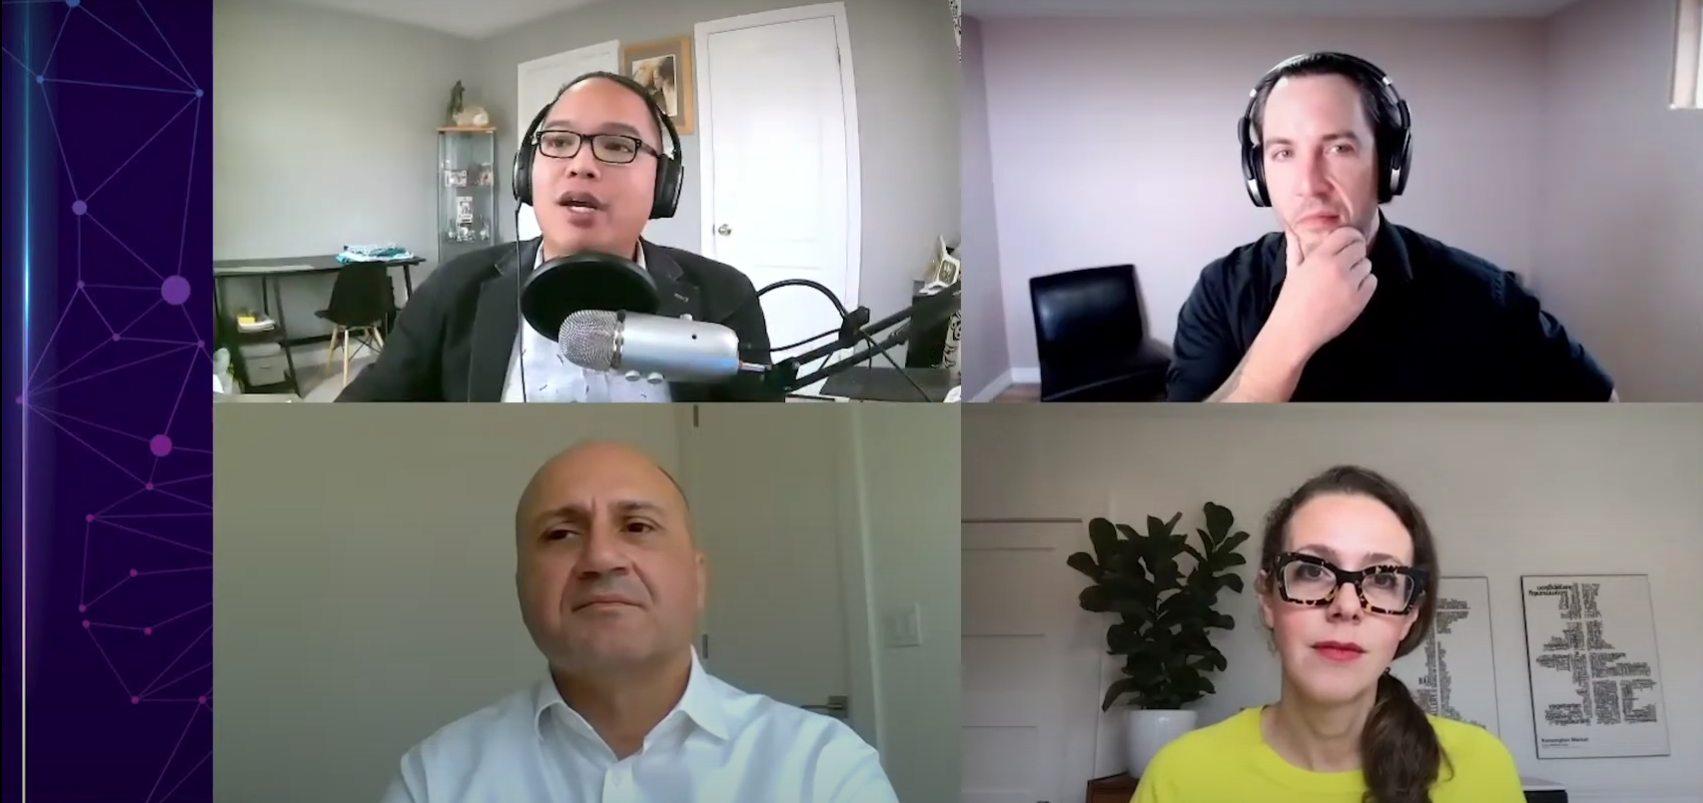 Sterling Lee, Adam Abernethy, Hanif Mawji, Monika Jaroszonek having an online meeting